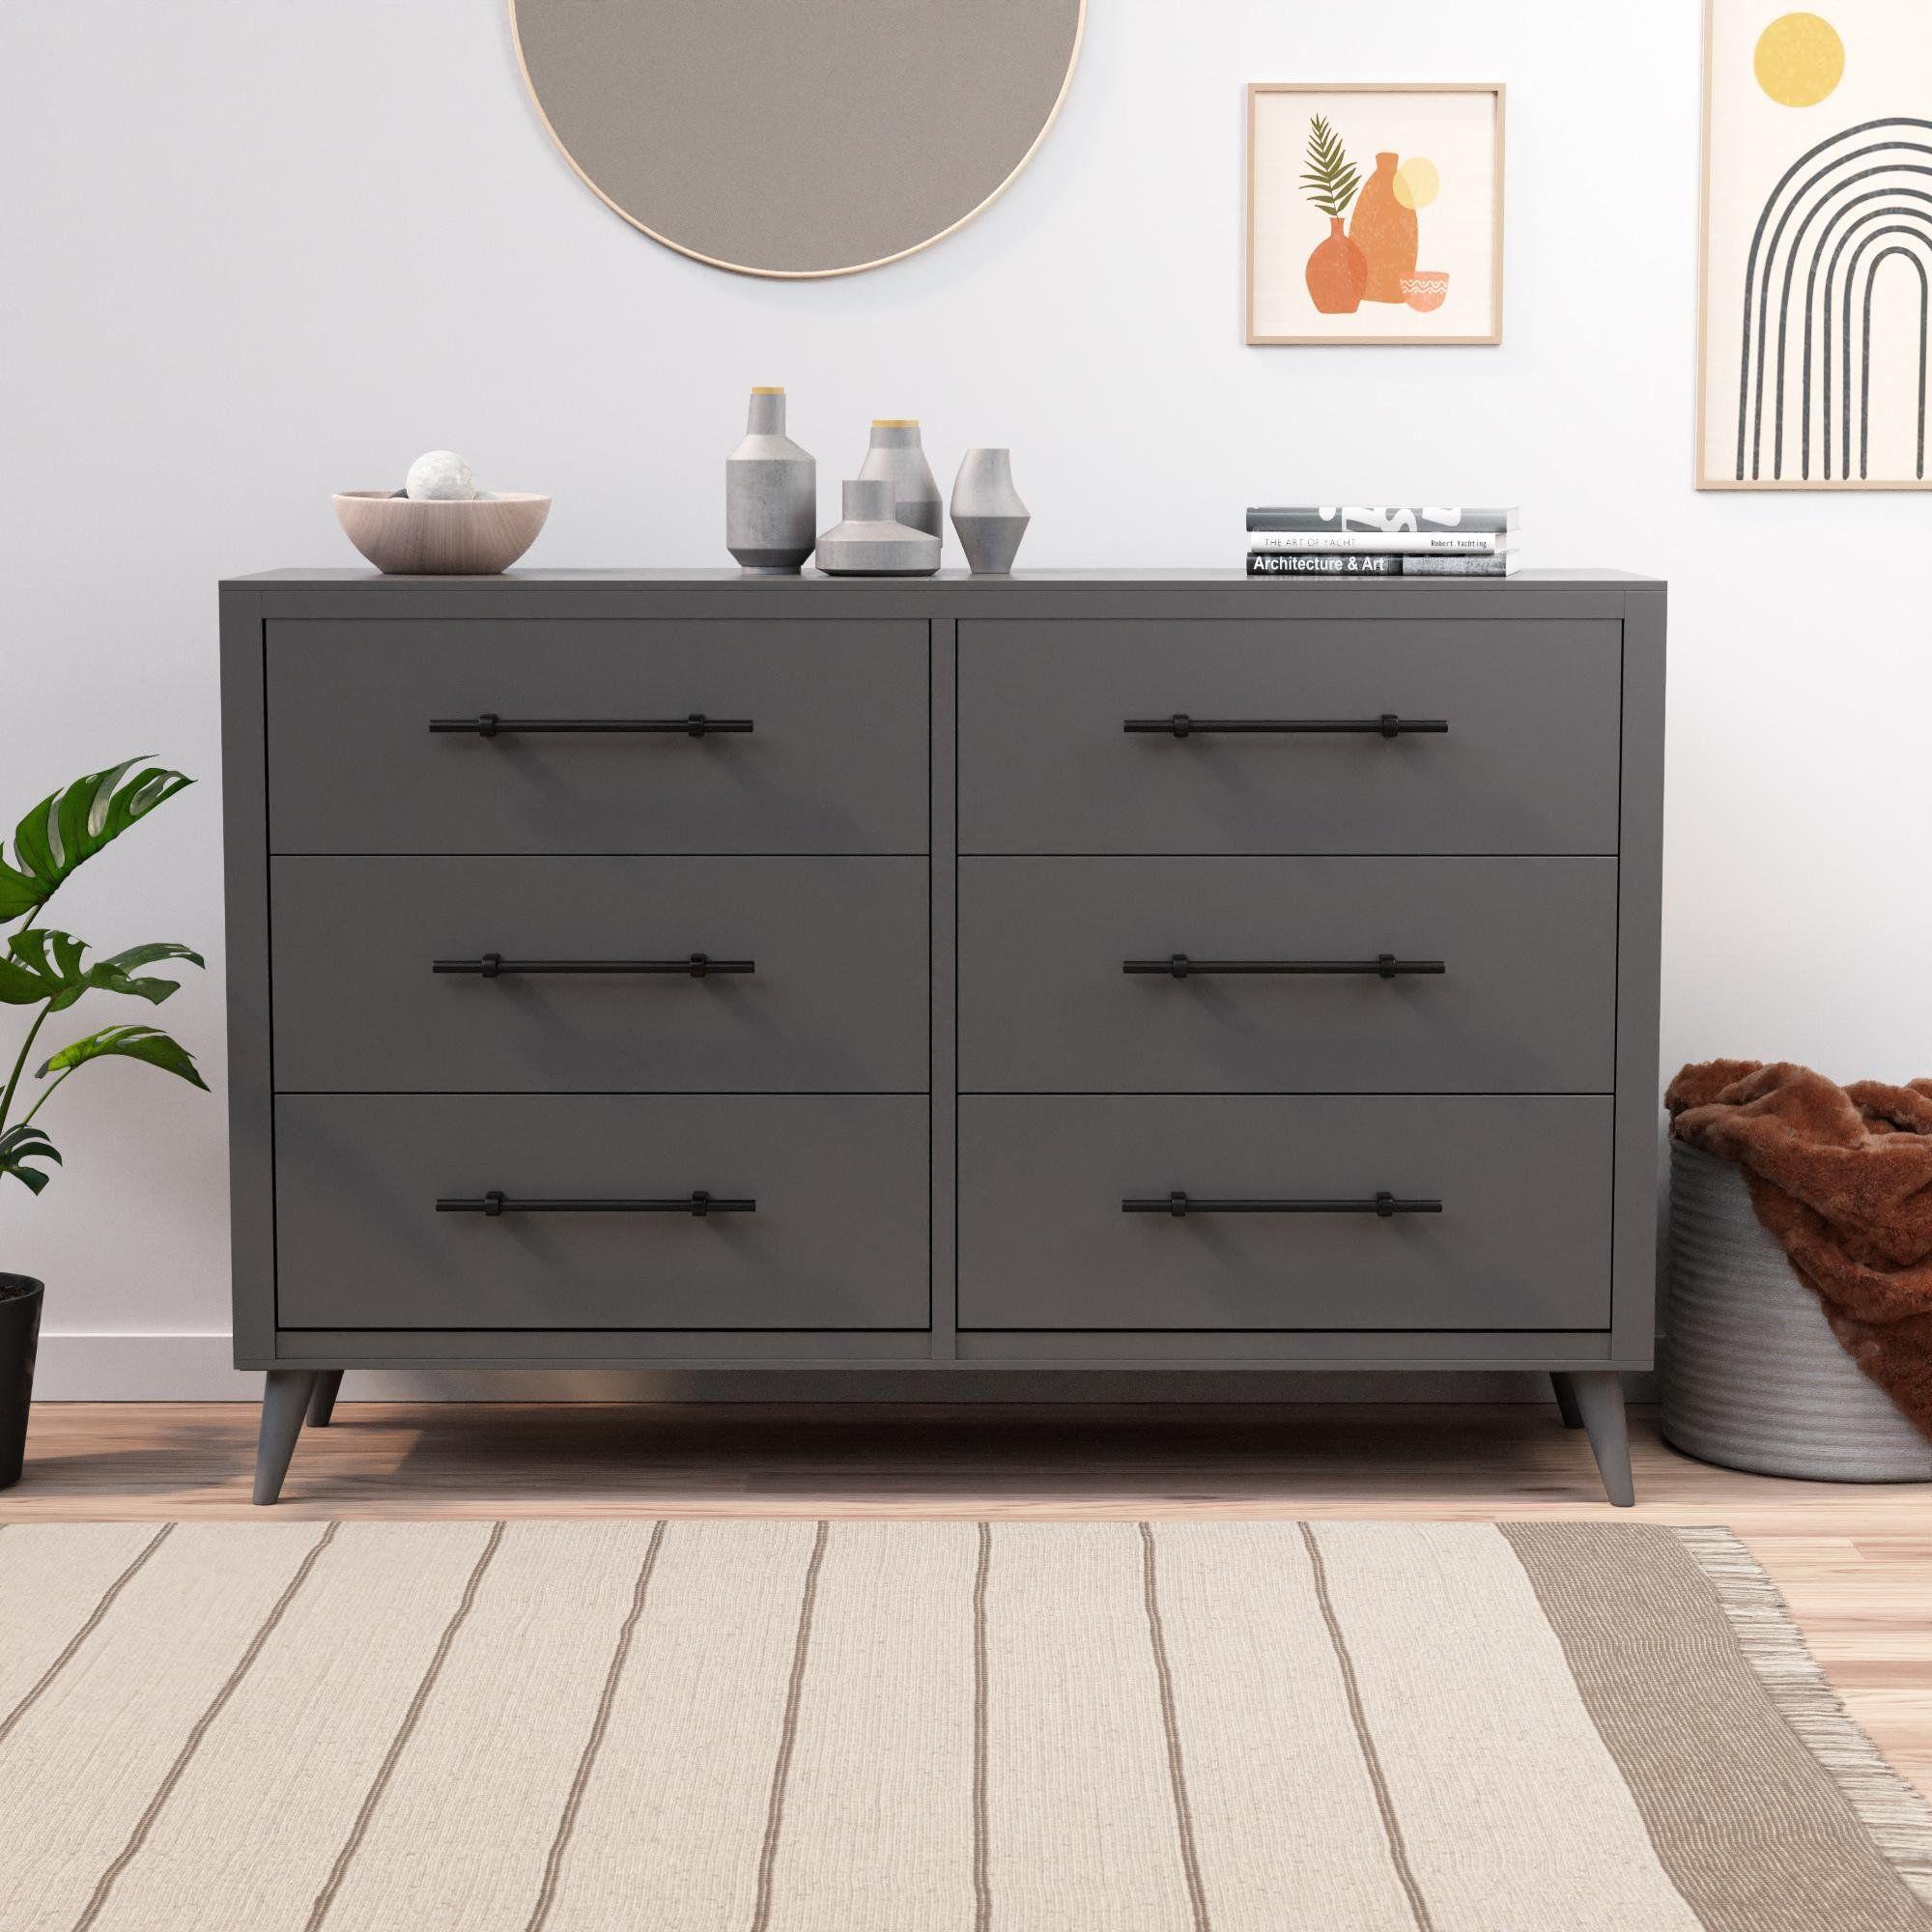 Rest Haven Mid Century Modern 6 Drawer Dresser White Walmart Com In 2021 Black Bedroom Furniture Black Dresser Bedroom Dresser Decor Bedroom [ 2000 x 2000 Pixel ]